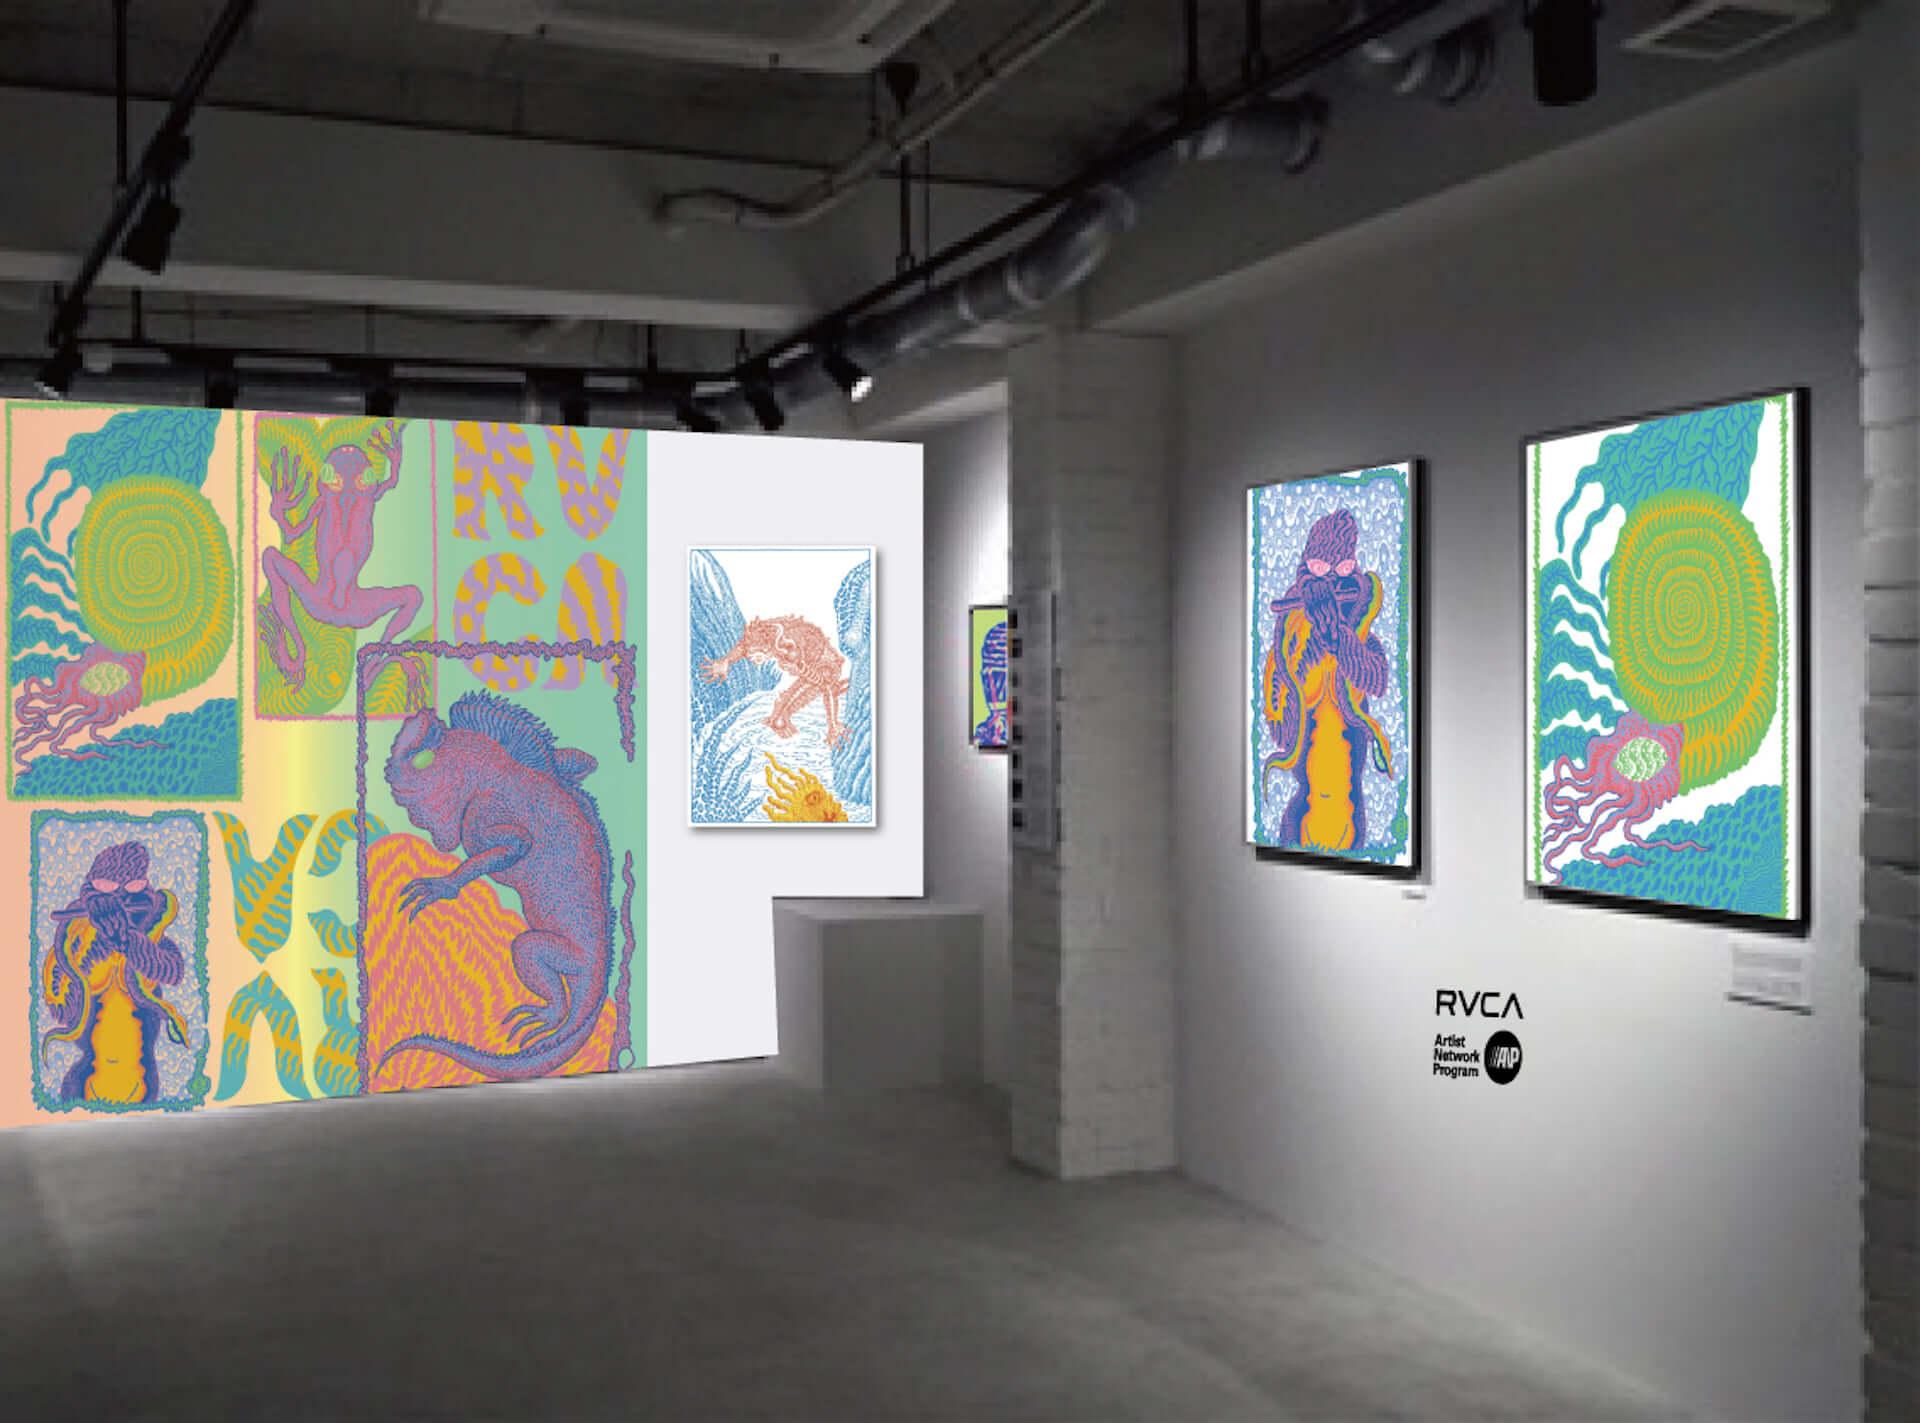 TETSUNORI TAWARAYAのアート展が「RVCA STORE SHIBUYA Gallery」にて開催決定!アーカイブ作品など期間限定で展示 art201125_tetsunori-tawaraya_4-1920x1423